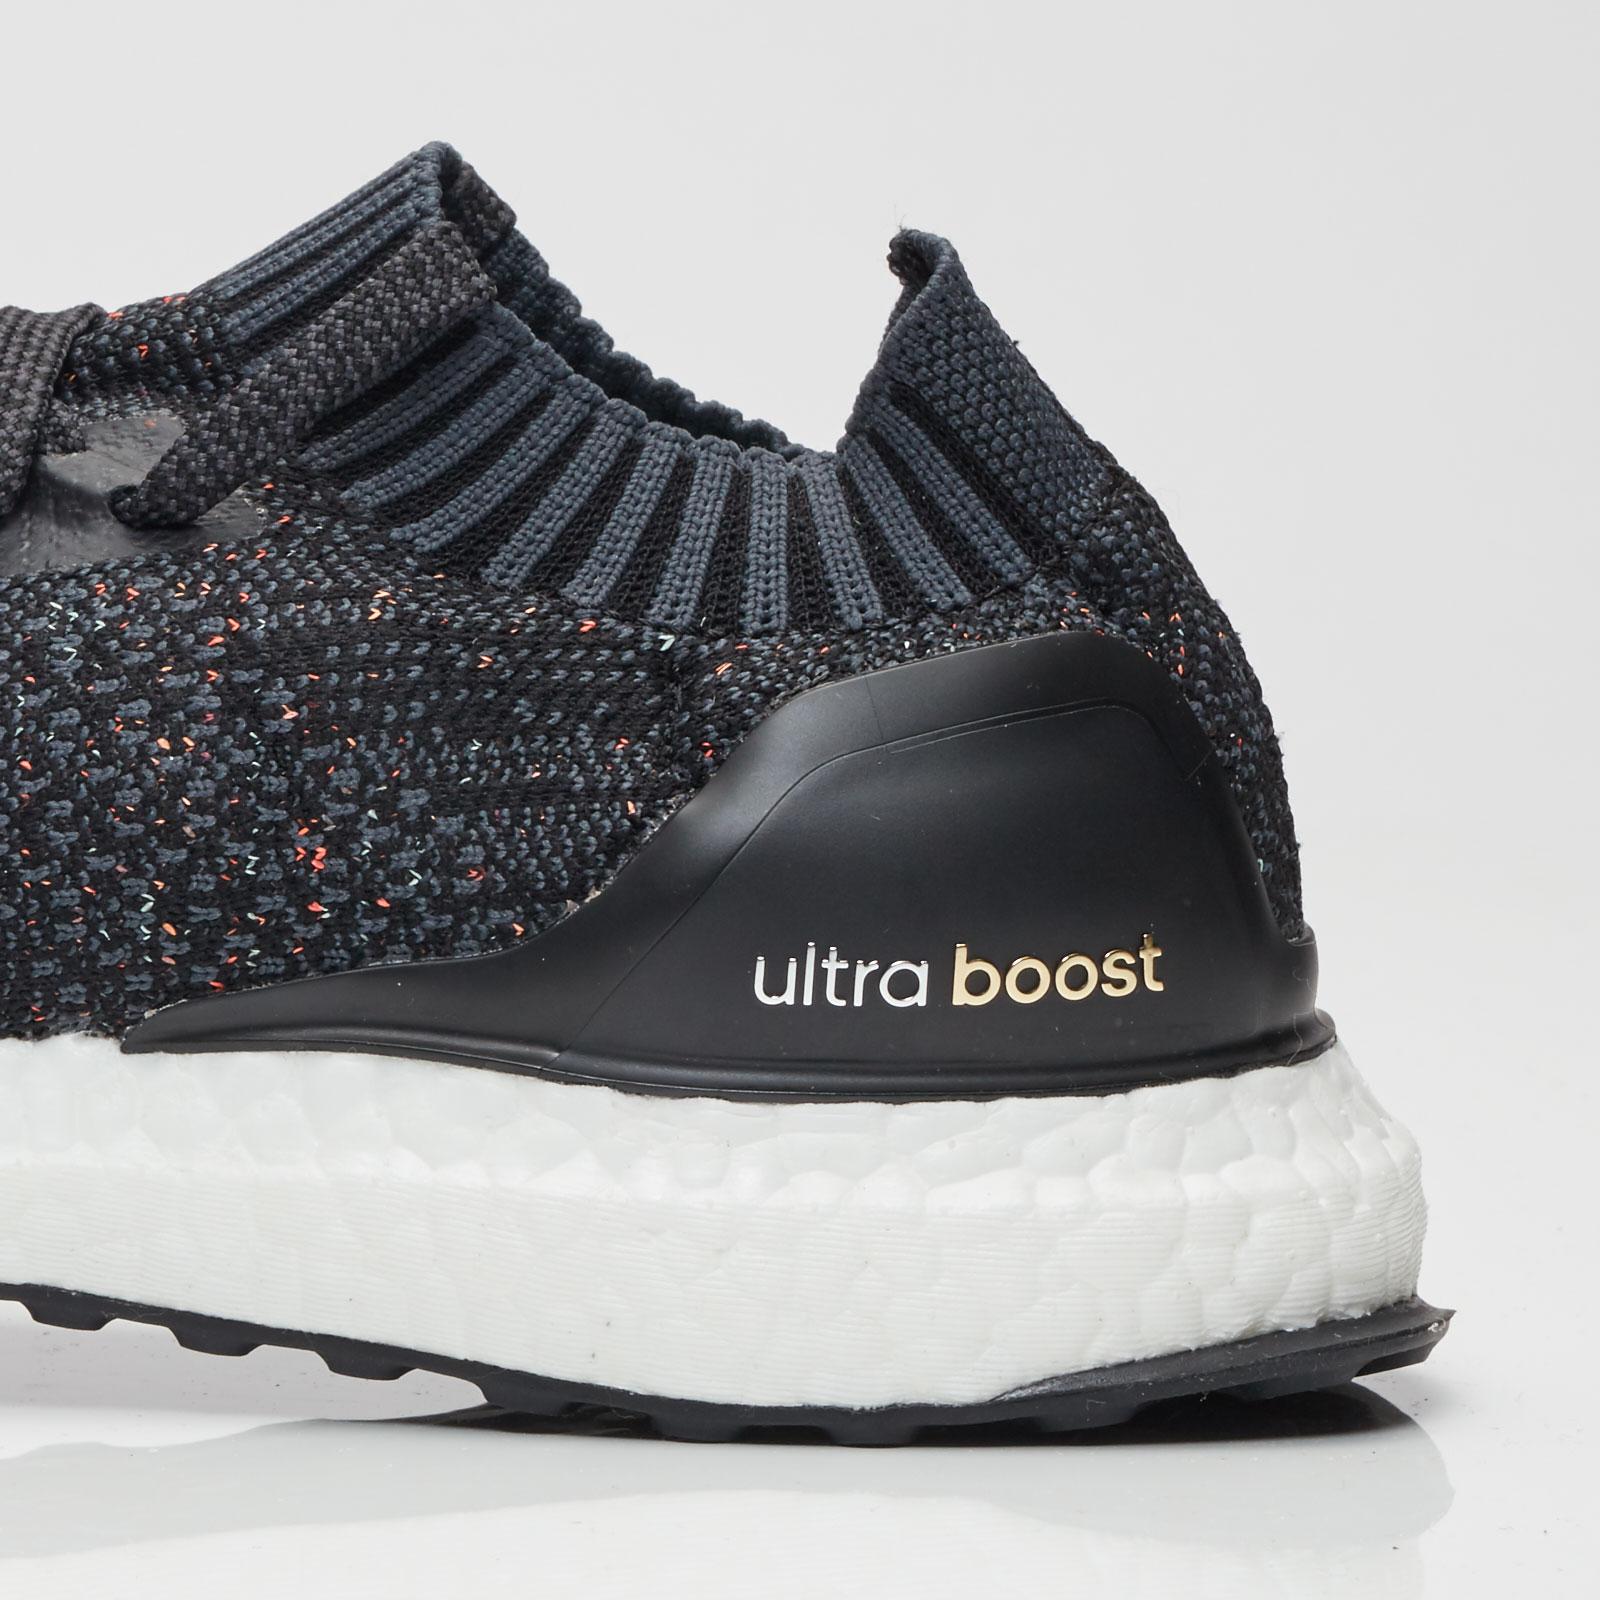 783bb658c40a5 adidas Ultra Boost Uncaged - Ba9796 - Sneakersnstuff